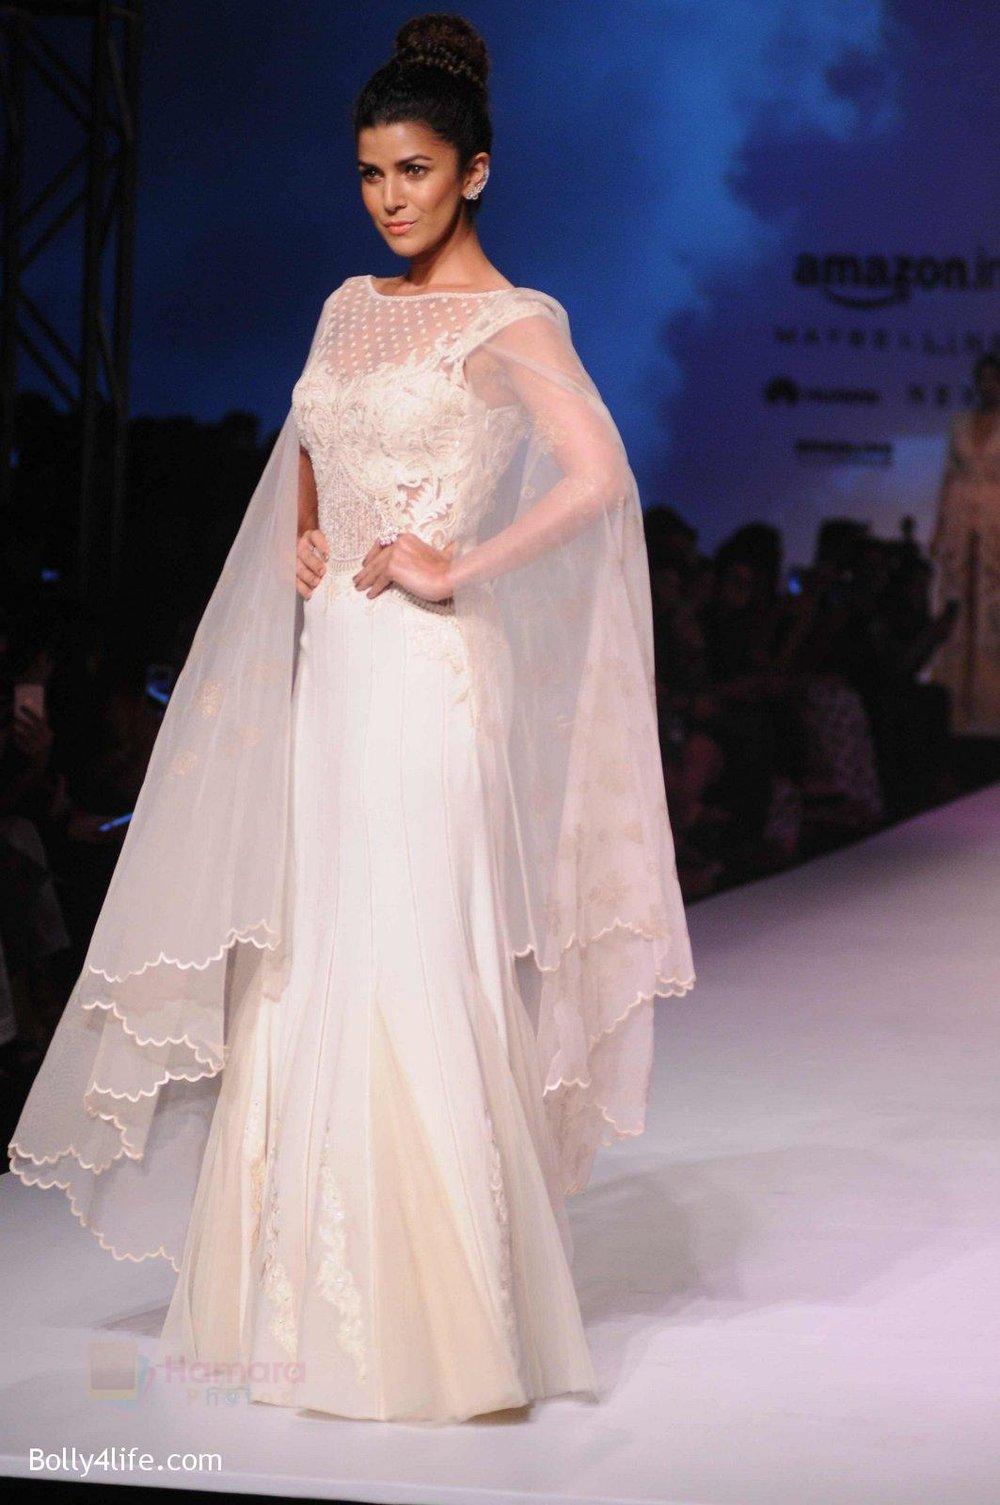 Nimrat-Kaur-walk-the-ramp-for-Mandira-Wrik_s-show-at-Amazon-India-Fashion-Week-on-15th-Oct-2016-46.jpg